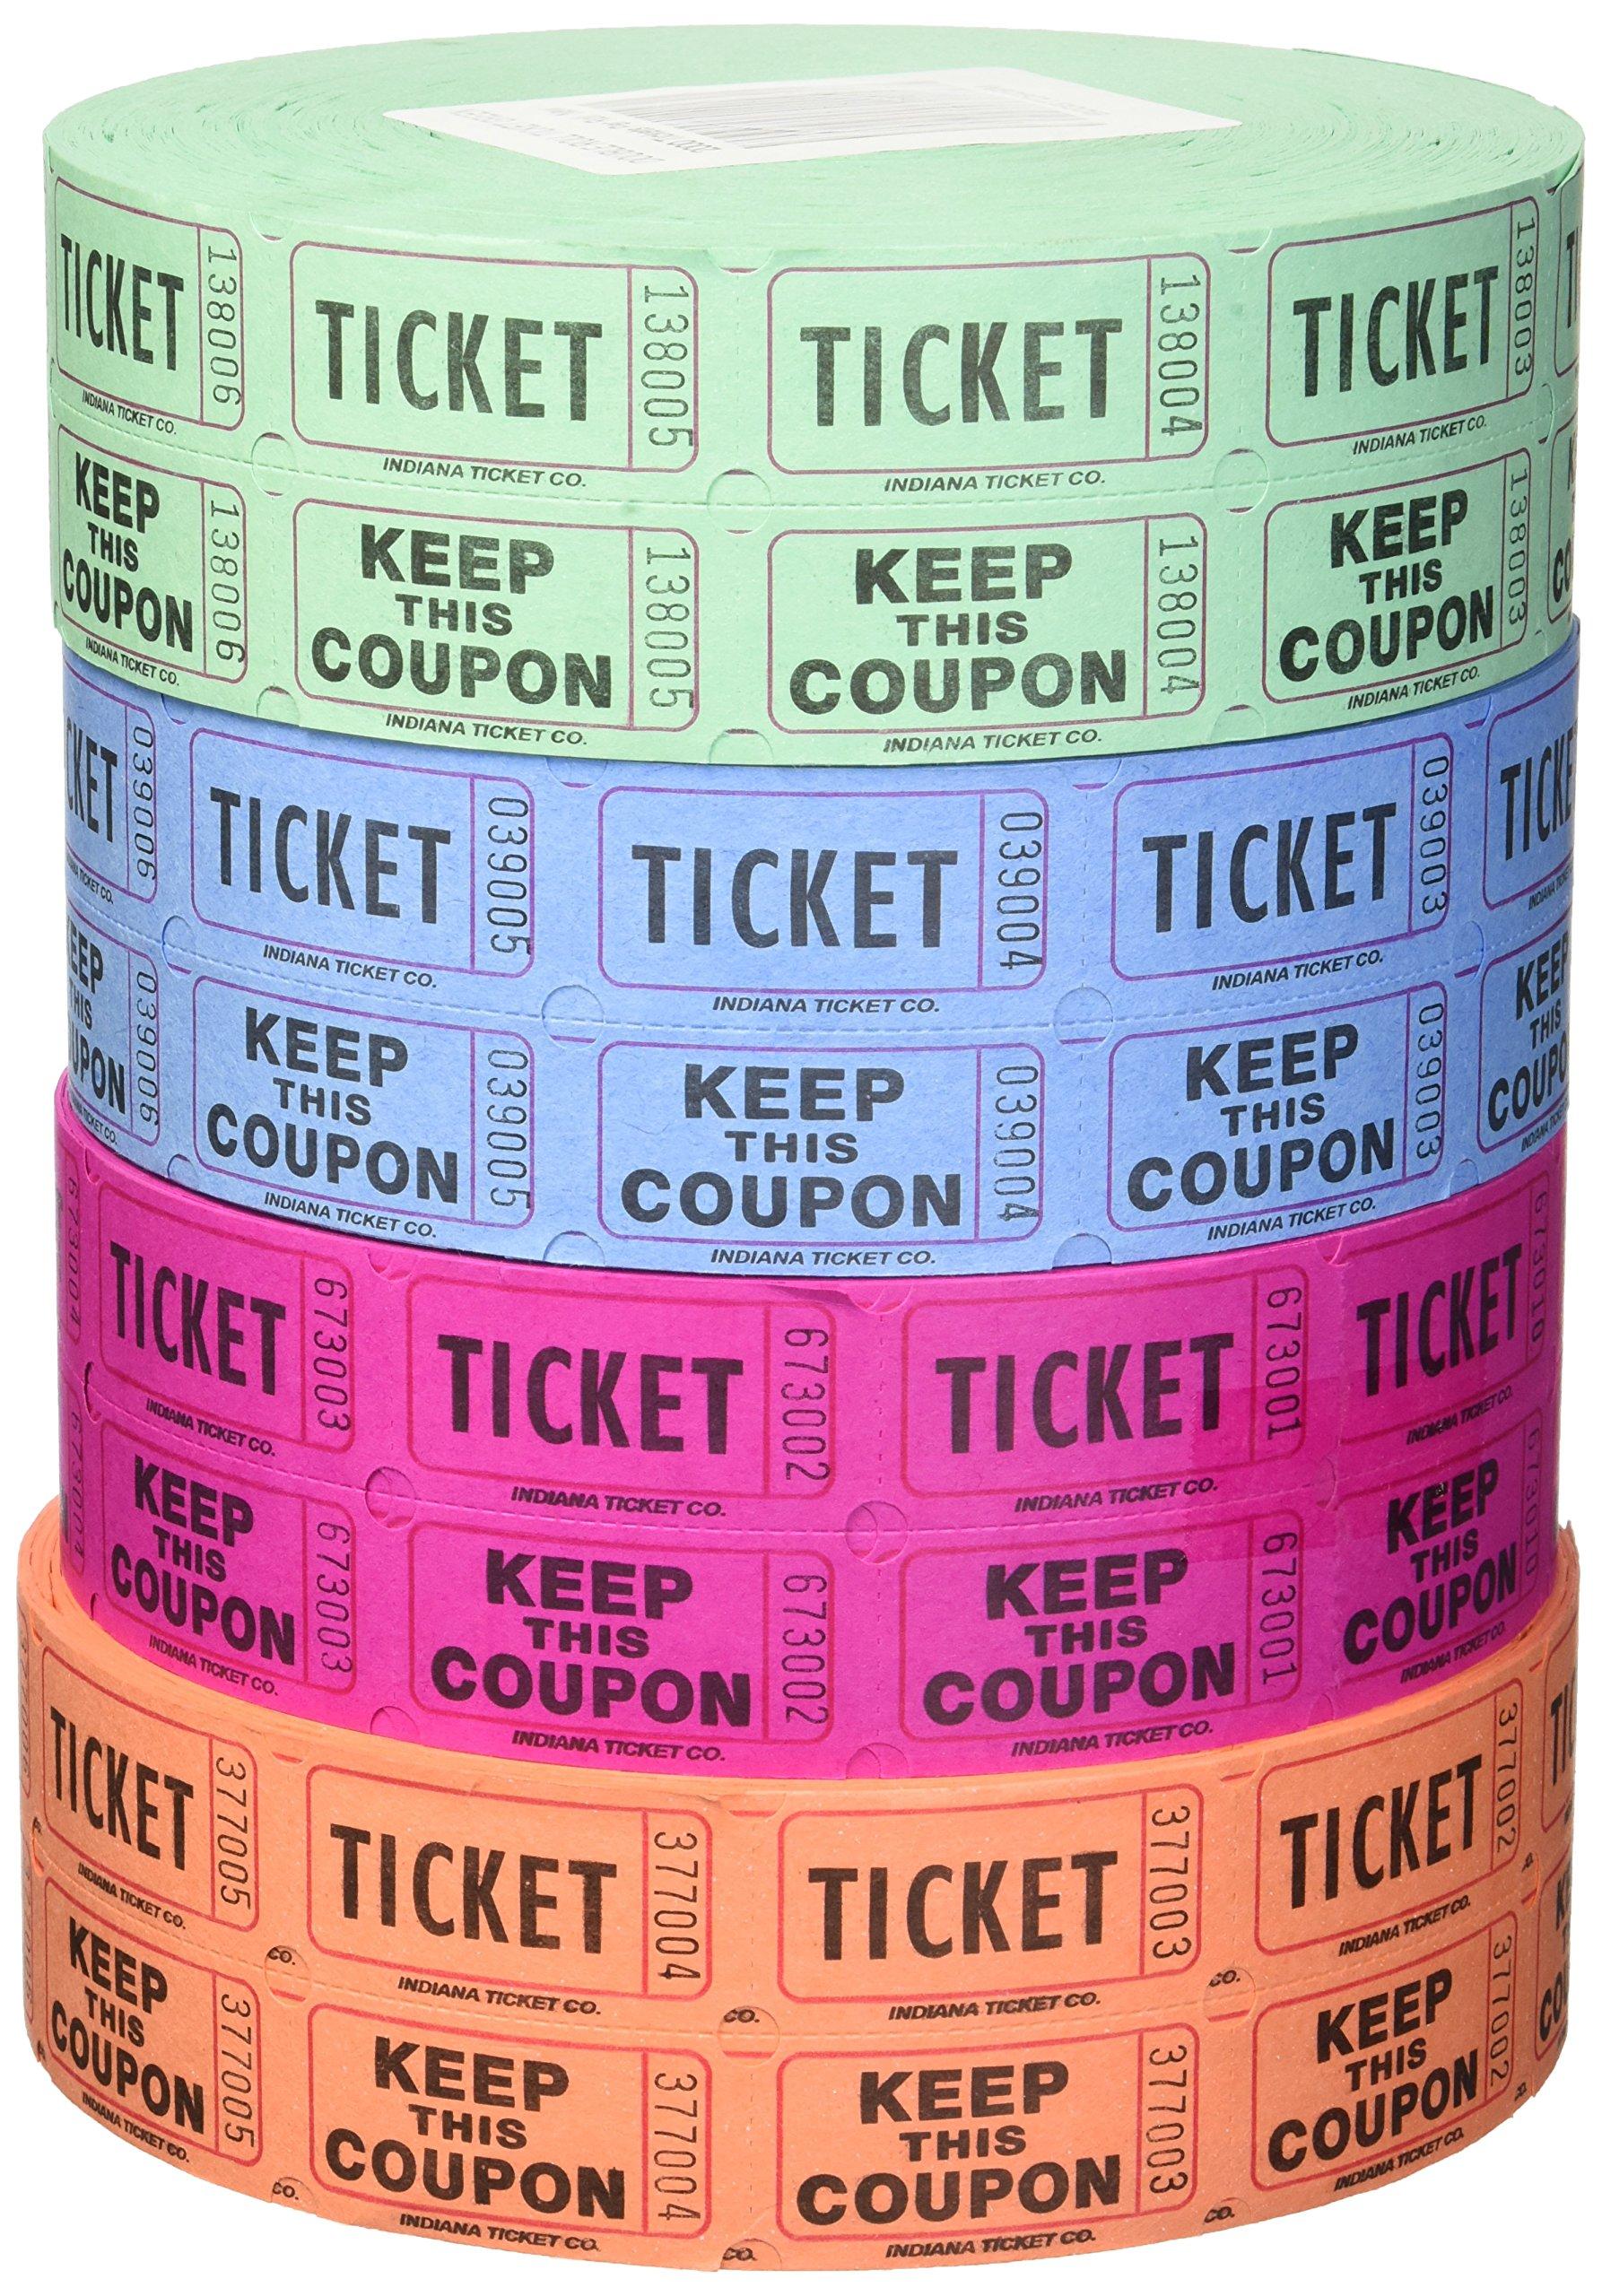 Indiana Ticket Company 56759 Raffle Tickets, (4 Rolls of 2000 Double Tickets) 8, 000 Total 50/50 Raffle Tickets, Assorted by Indiana Ticket Company